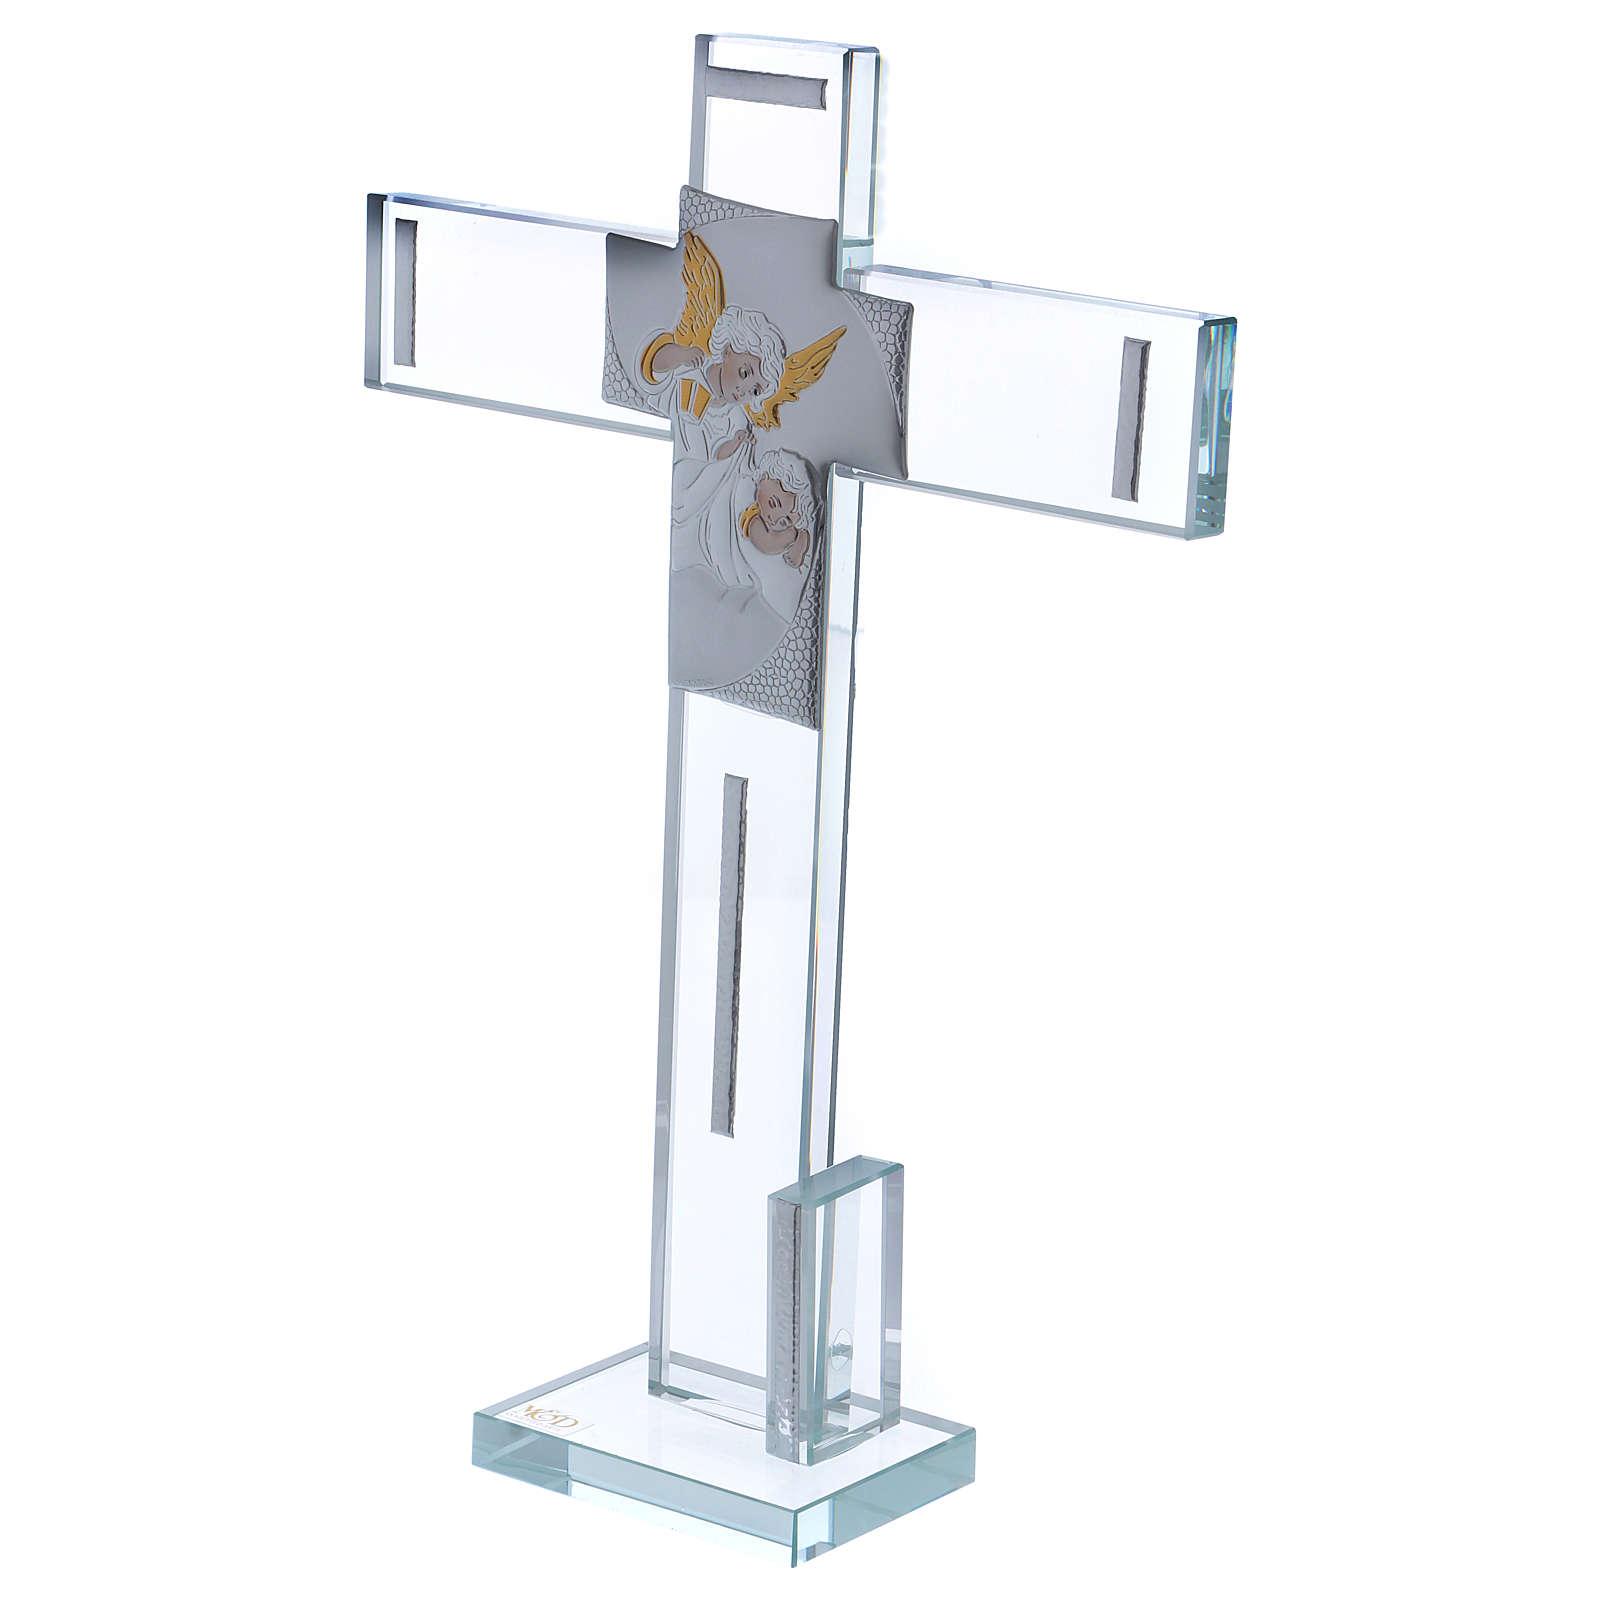 Idea regalo Battesimo Croce con Angelo 30x20 cm 3